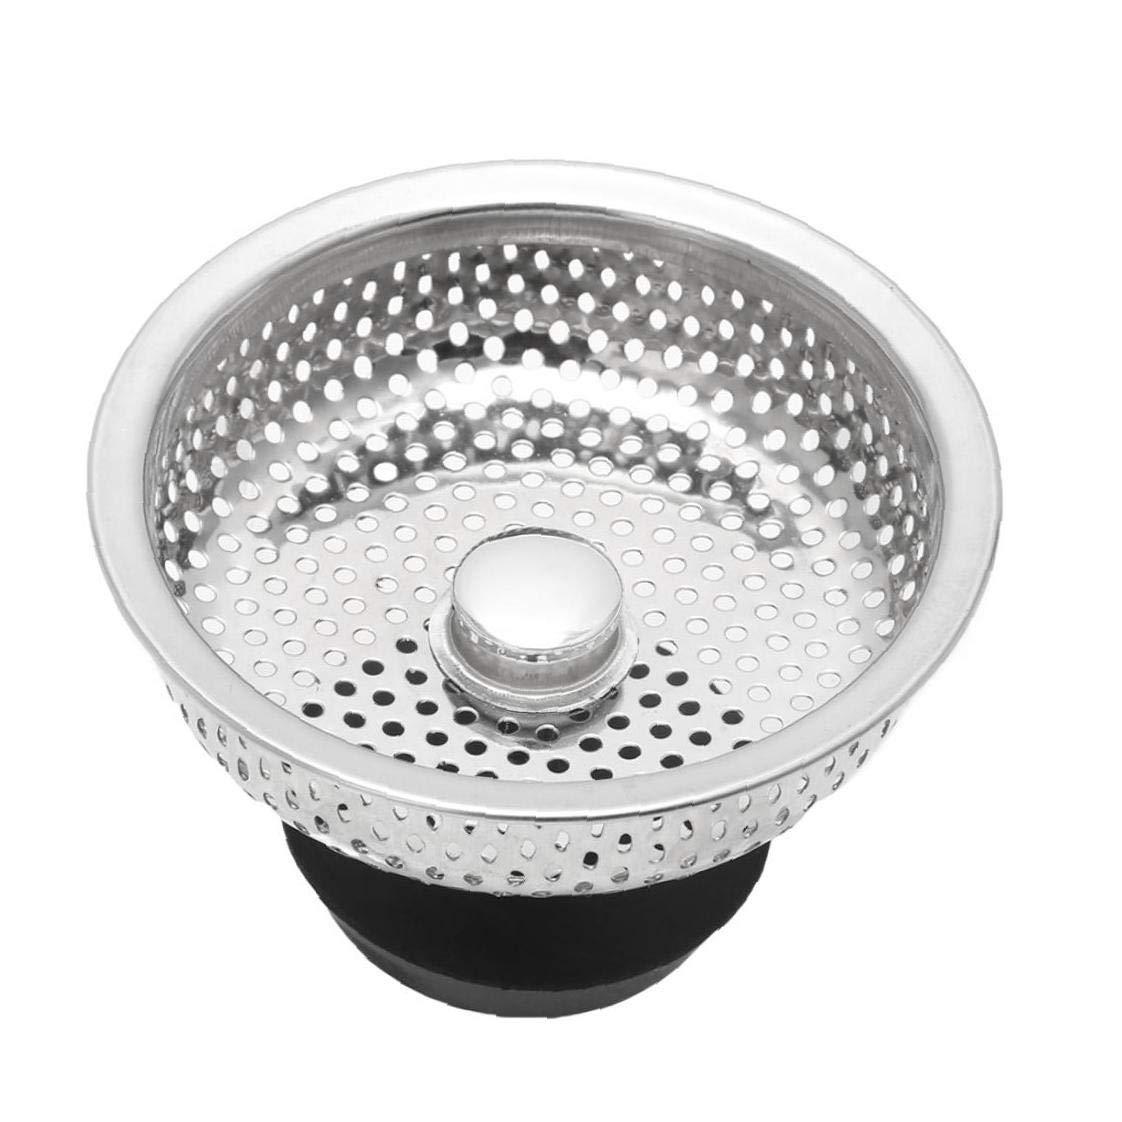 Angoter 1pc Cocina De Acero Inoxidable Fregadero Colador Filtro De Desag/üe Tap/ón